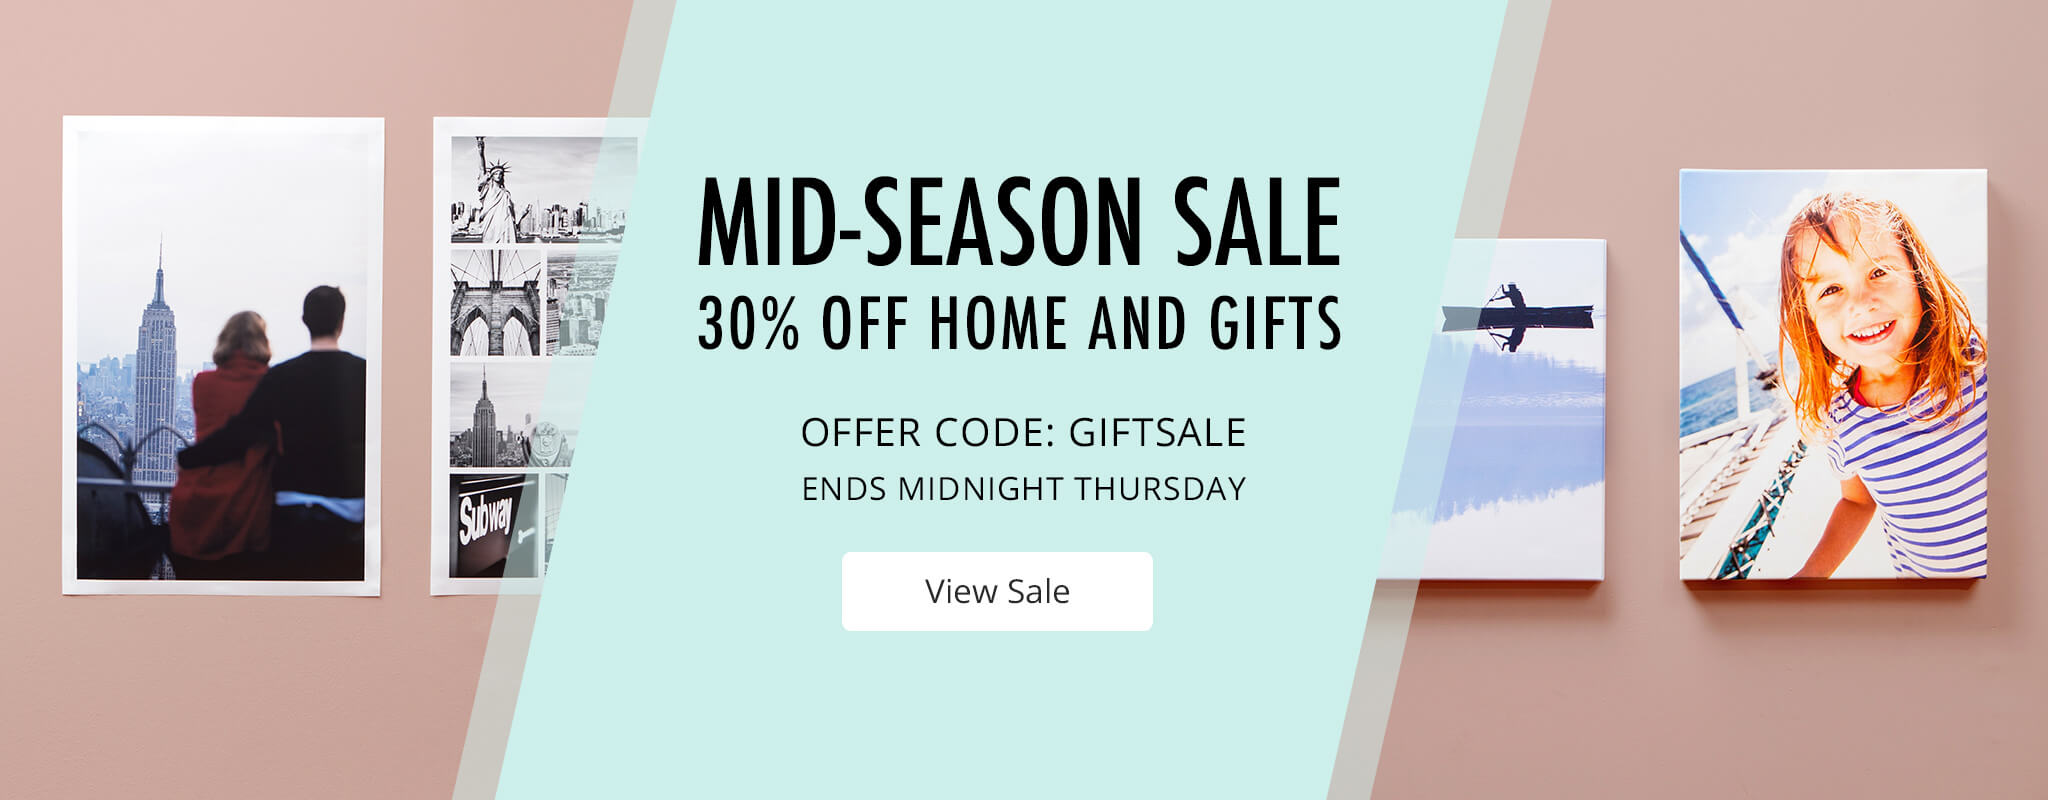 Mid-Season Sale - Carousel 1